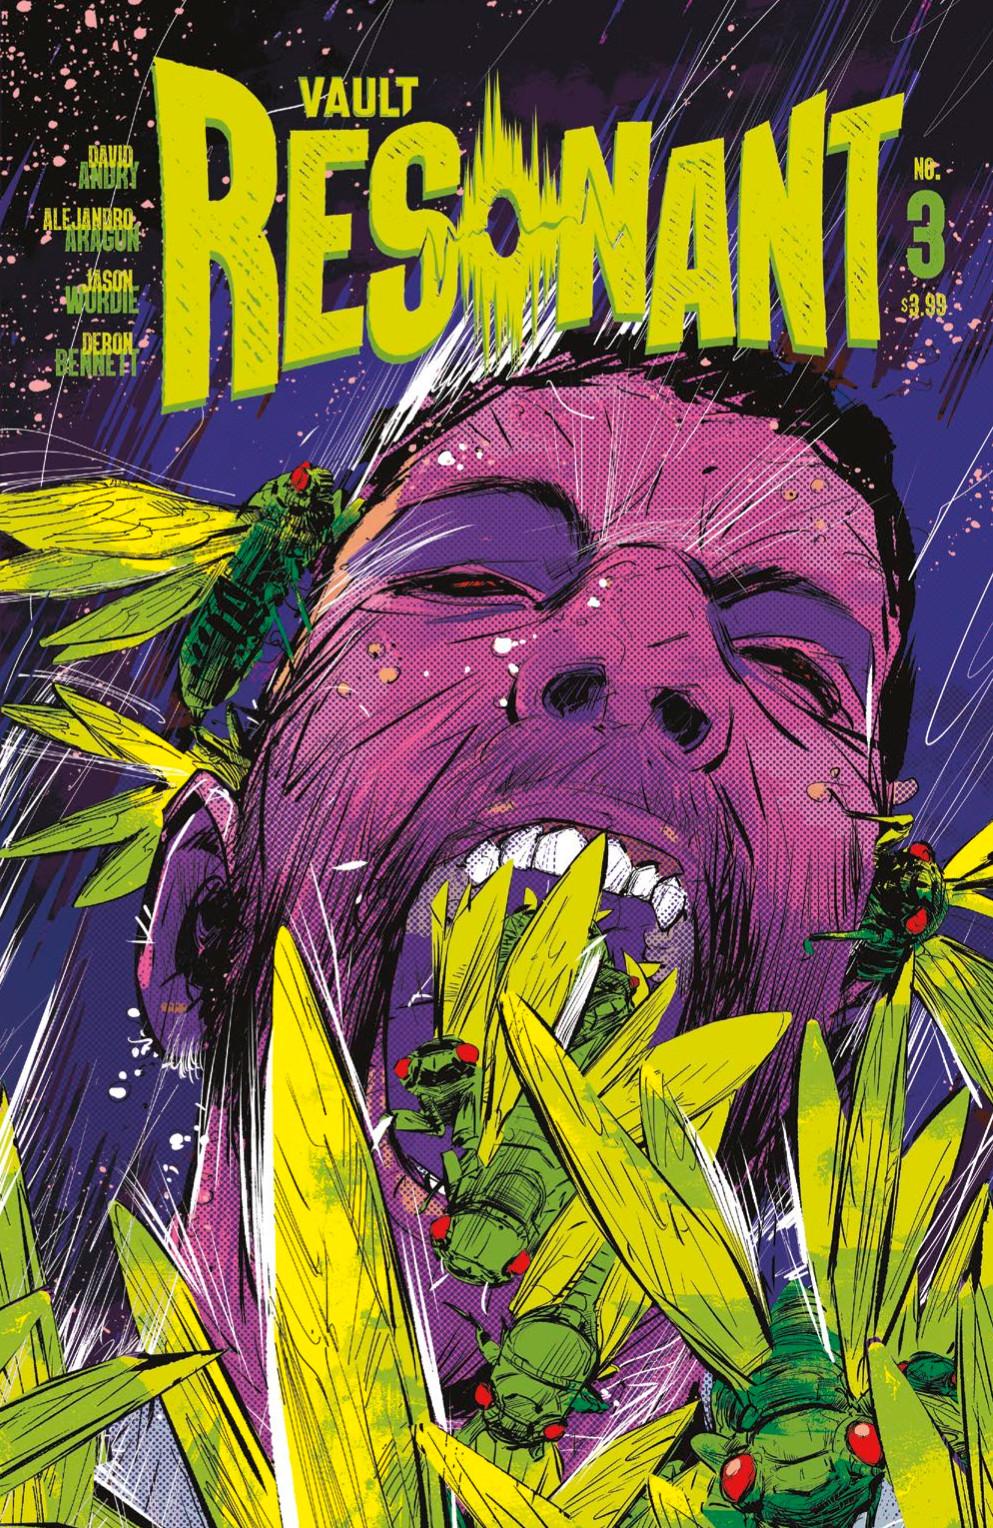 Resonant, issue #3, cover, Vault Comics, Andry/Aragón